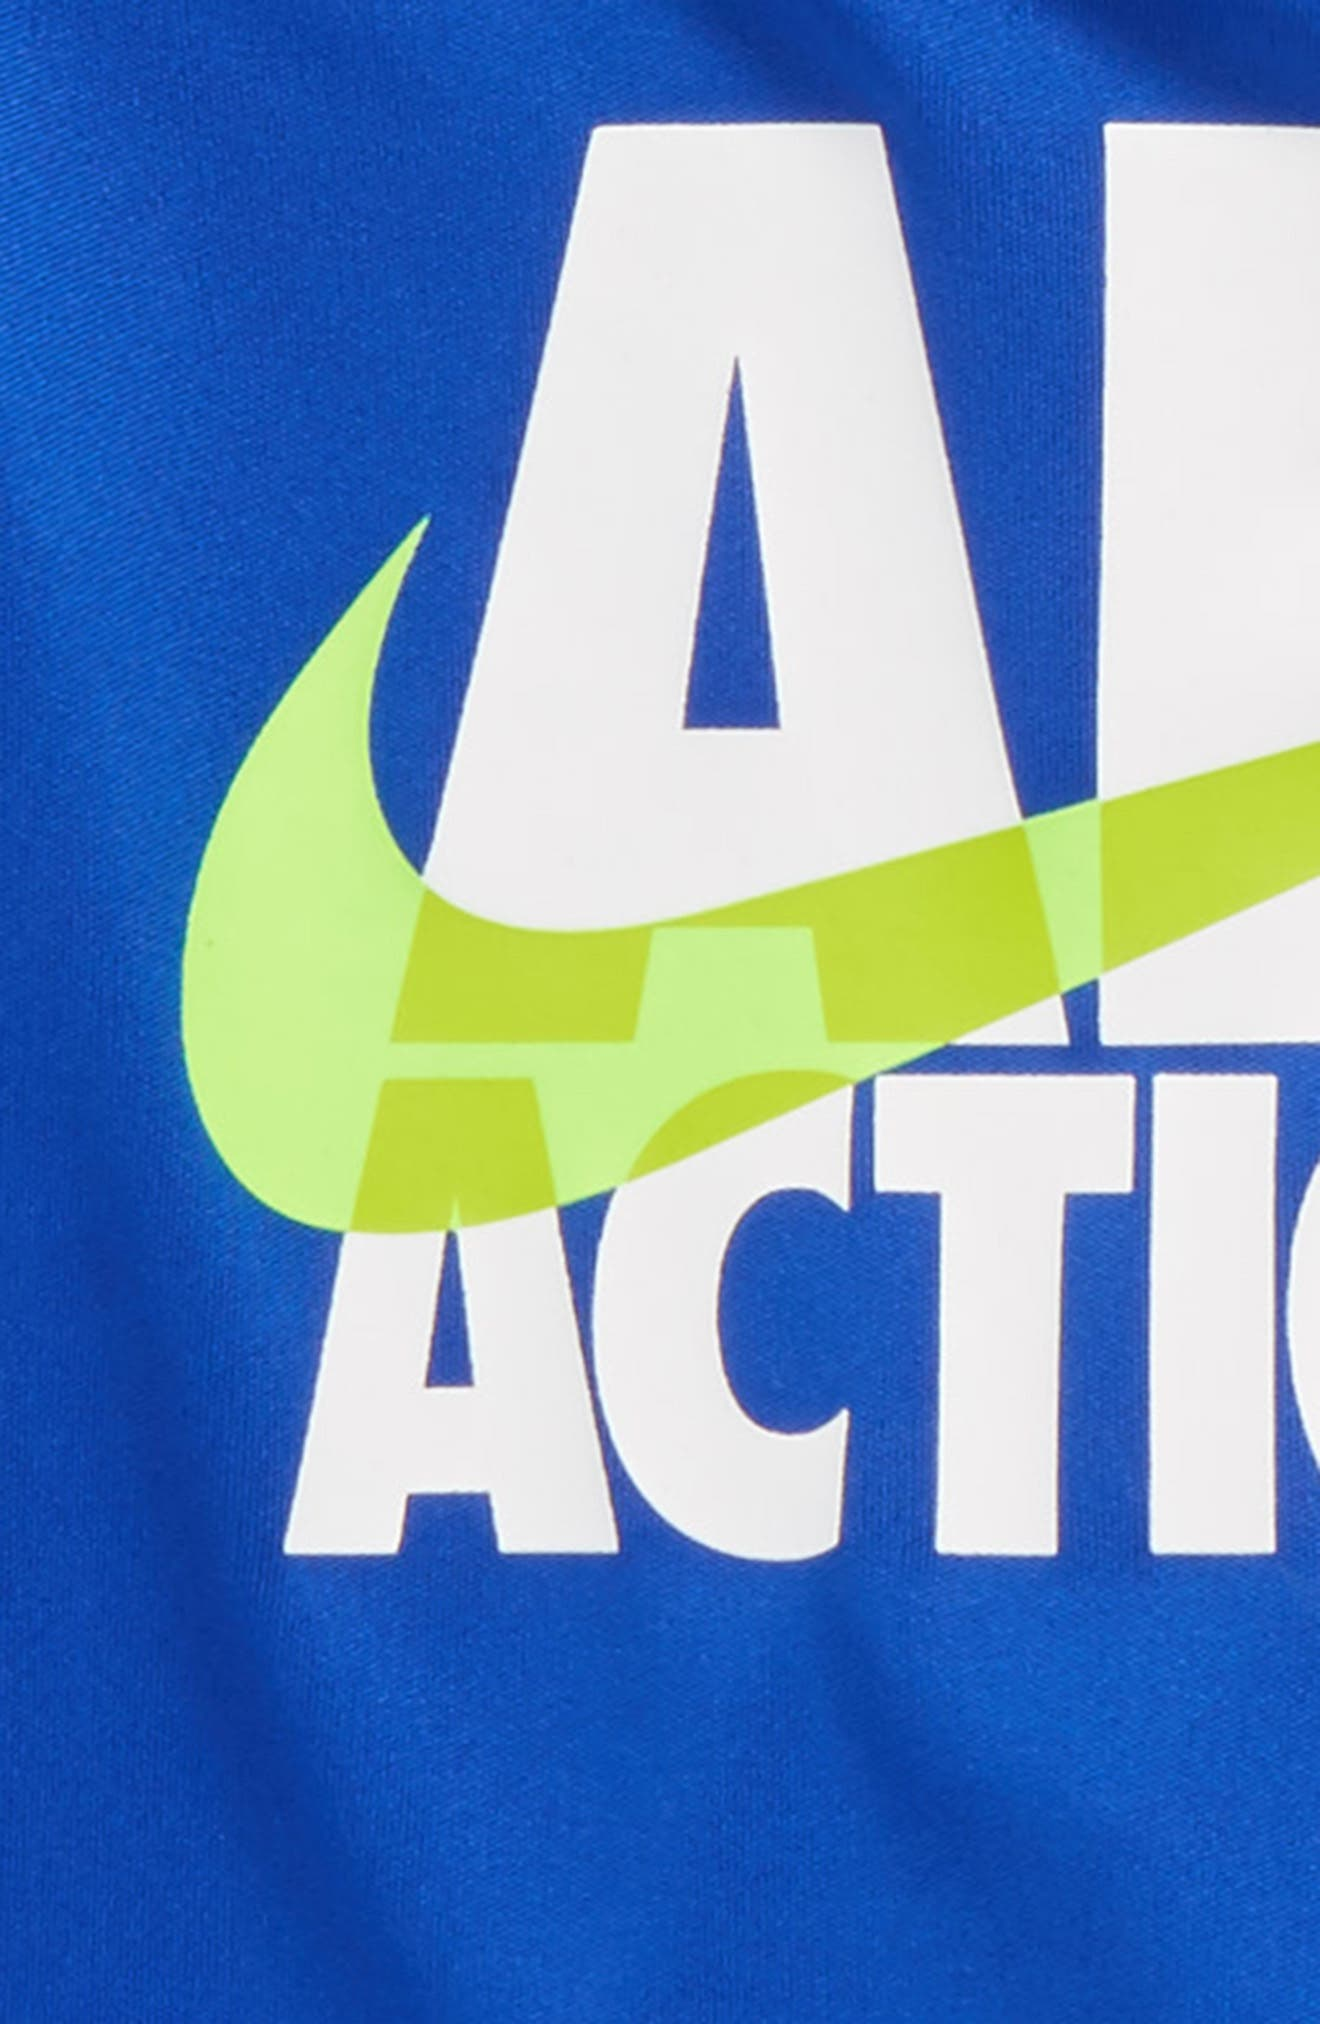 All Action Dry T-Shirt & Shorts Set,                             Alternate thumbnail 2, color,                             434